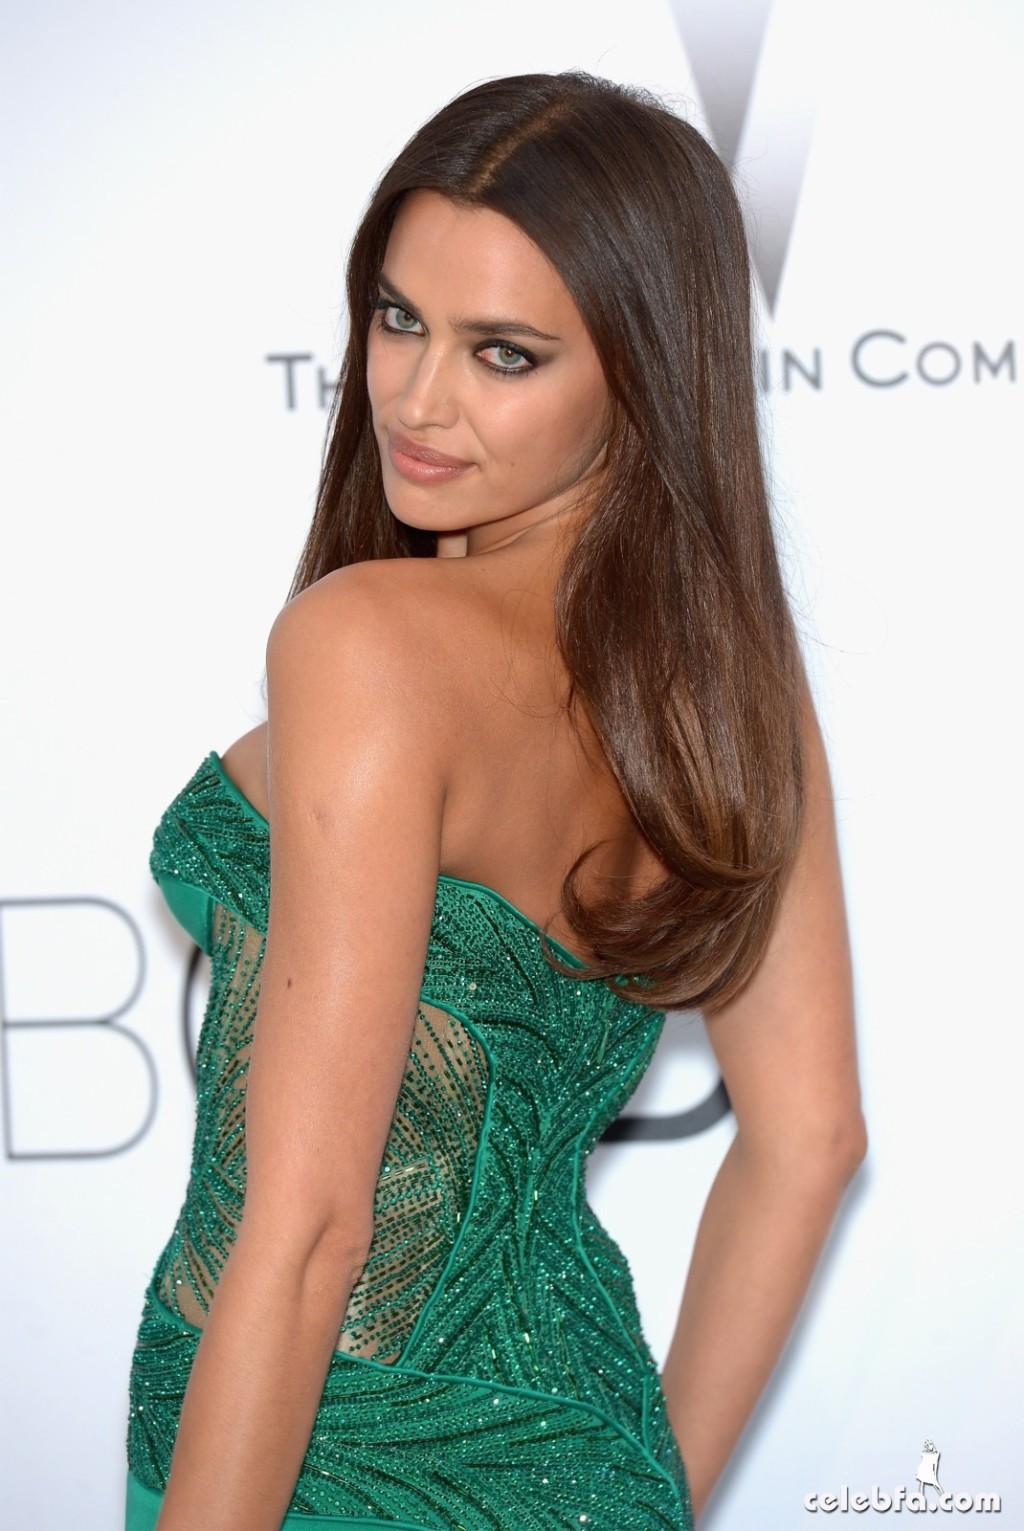 Irina_Shayk_amfAR's Cannes Gala (2)